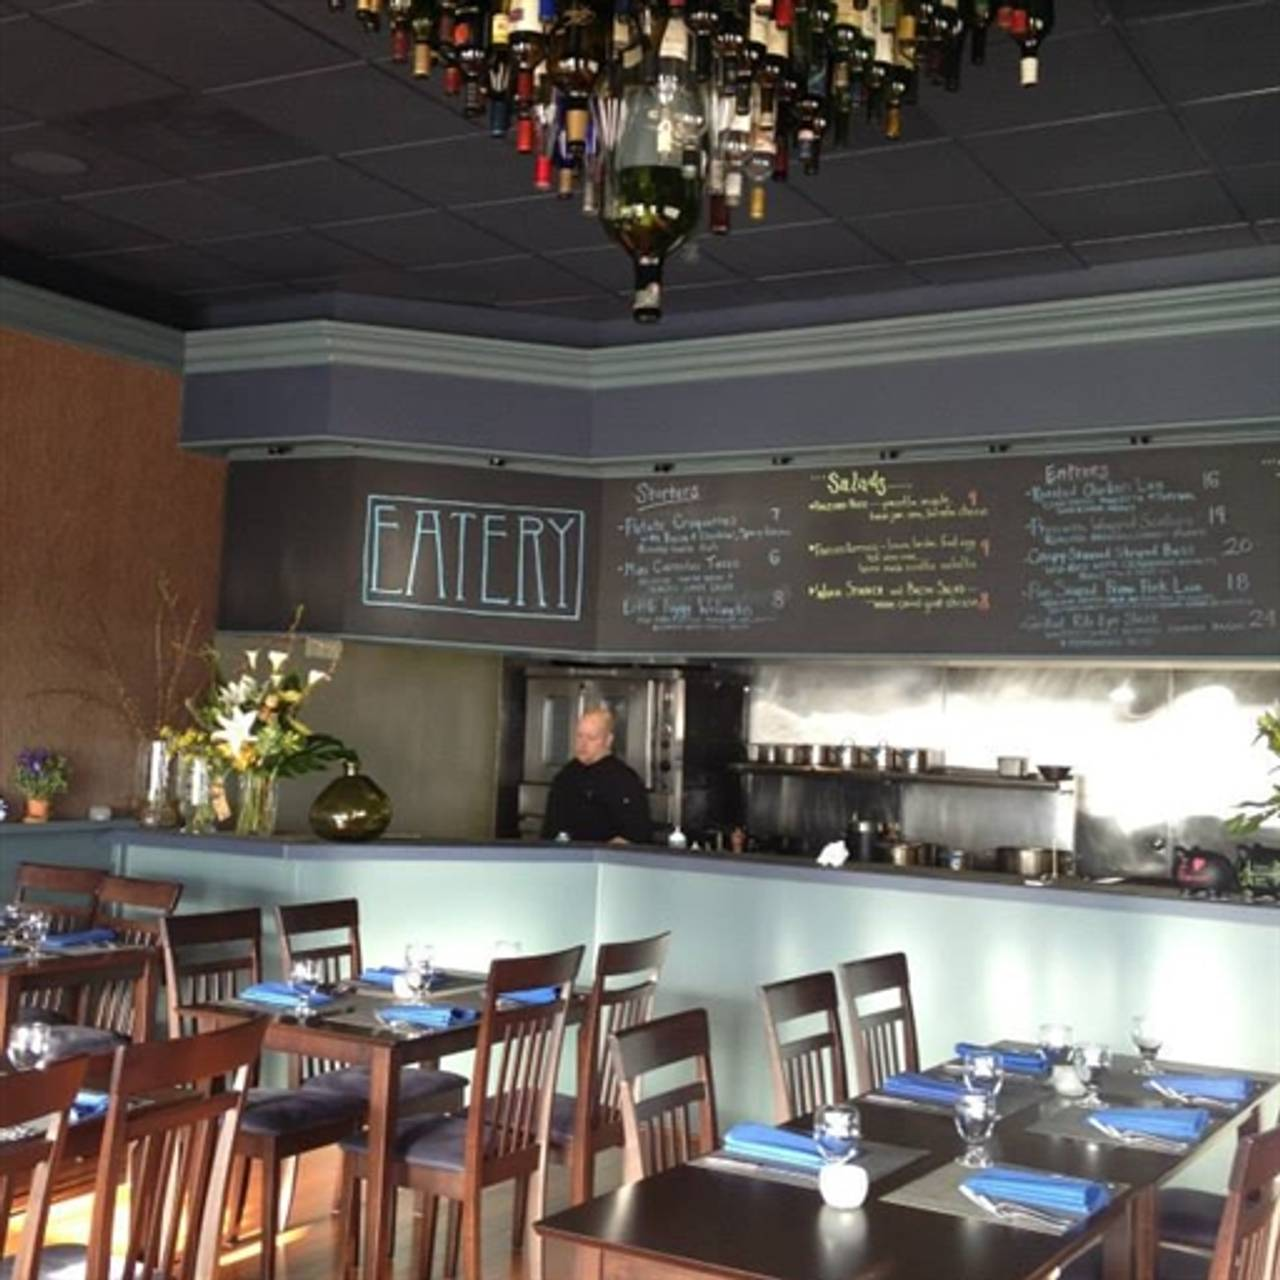 tap & kitchen Restaurant - Pasadena, CA | OpenTable